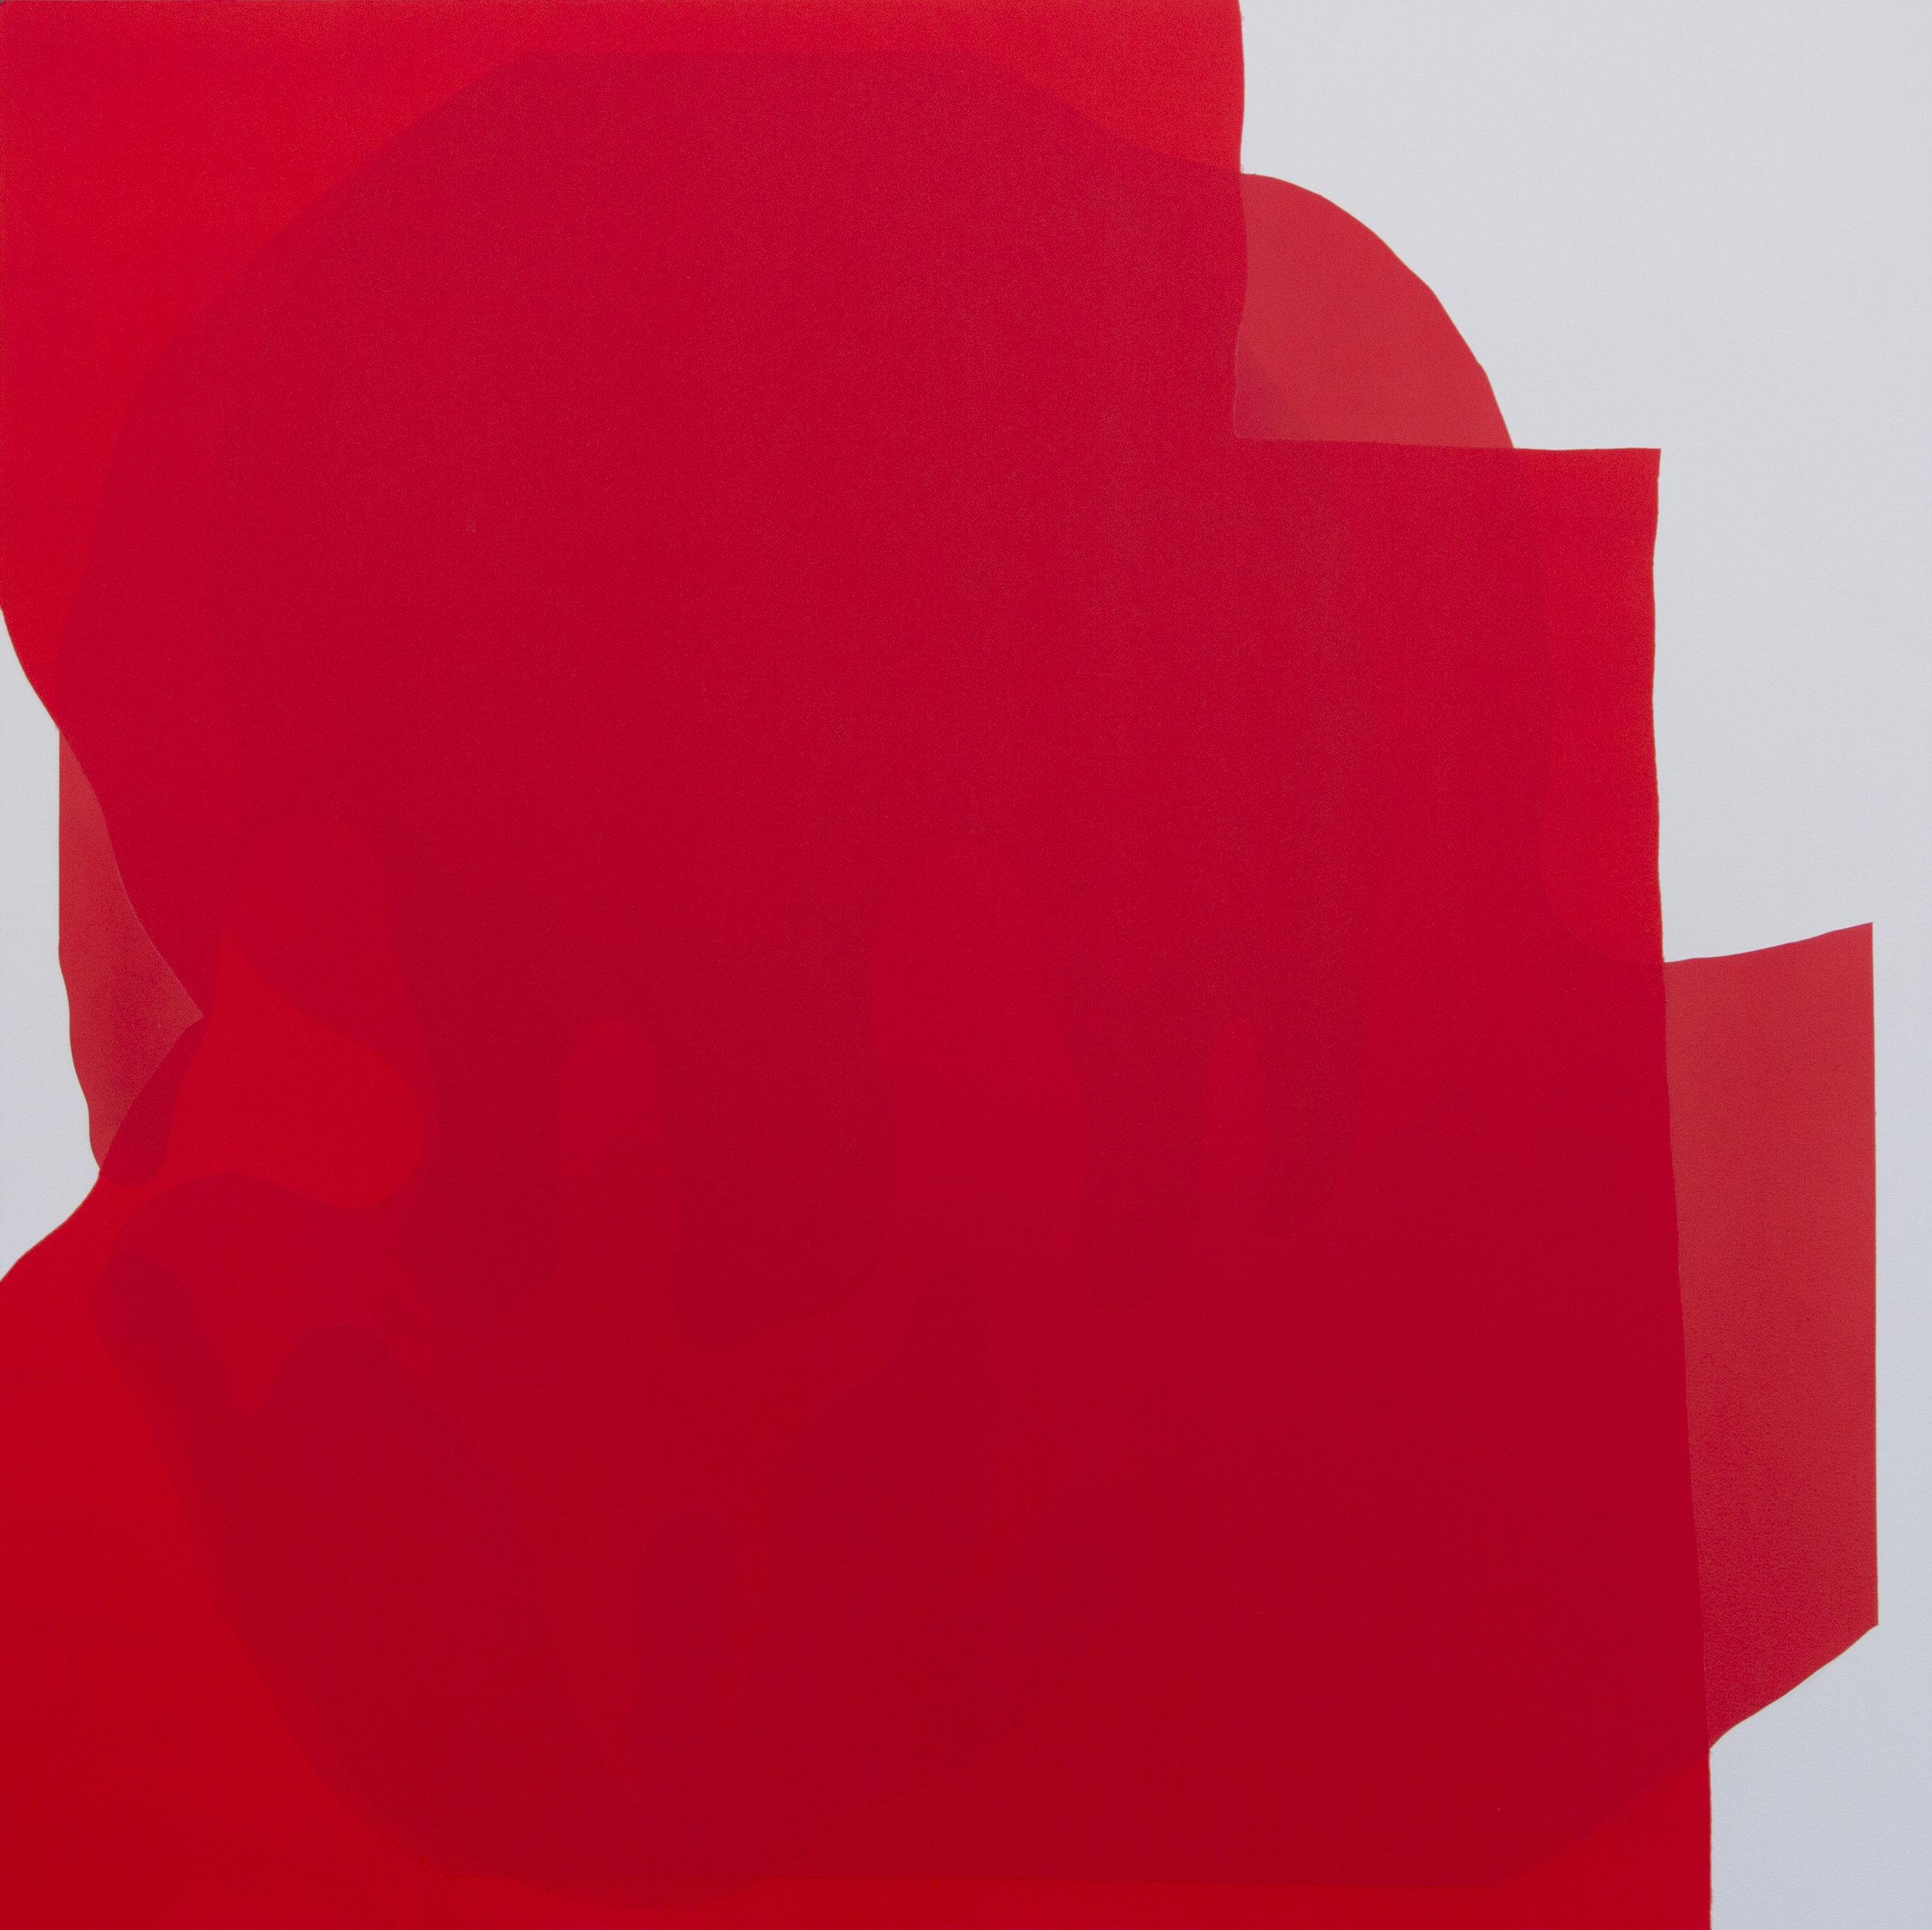 Title-Godhead_50x50_Pigment:Binder_Canvas.jpg